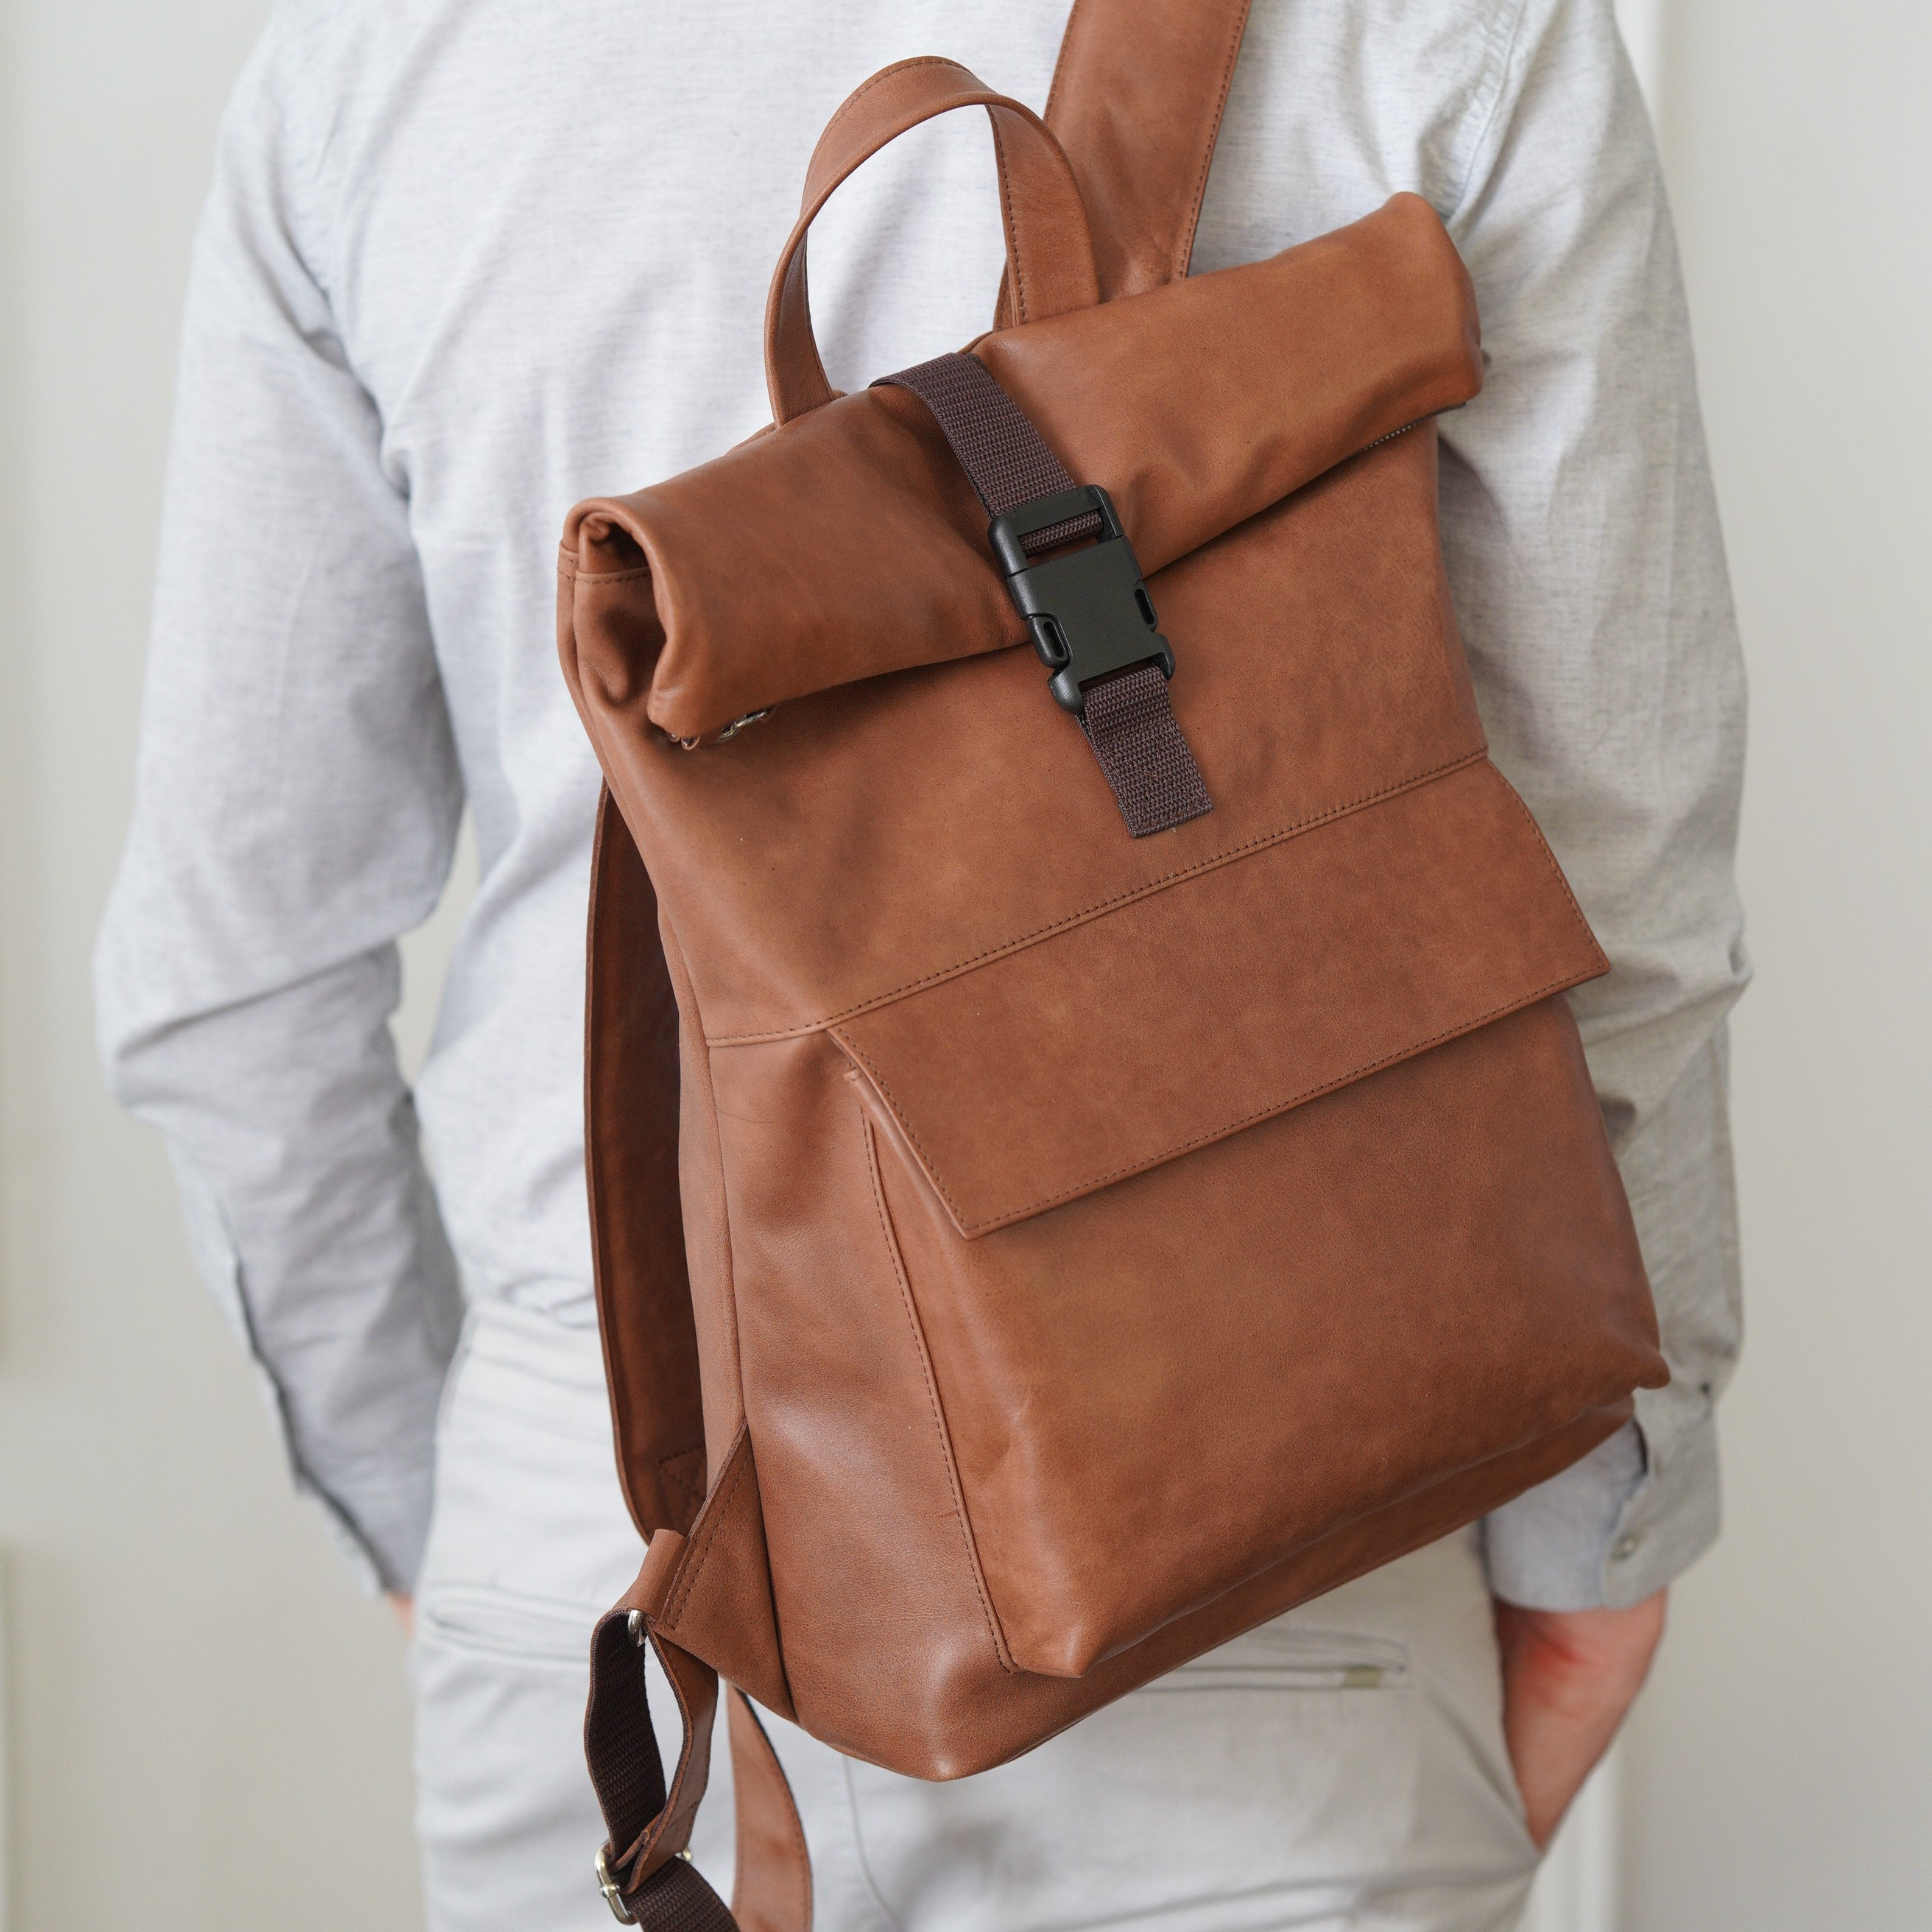 Women/'s backpack,Laptop backpack Custom backpack Big backpack,Leather rucksack,Handmade Women/'s daily pack Dragon Brown leather backpack